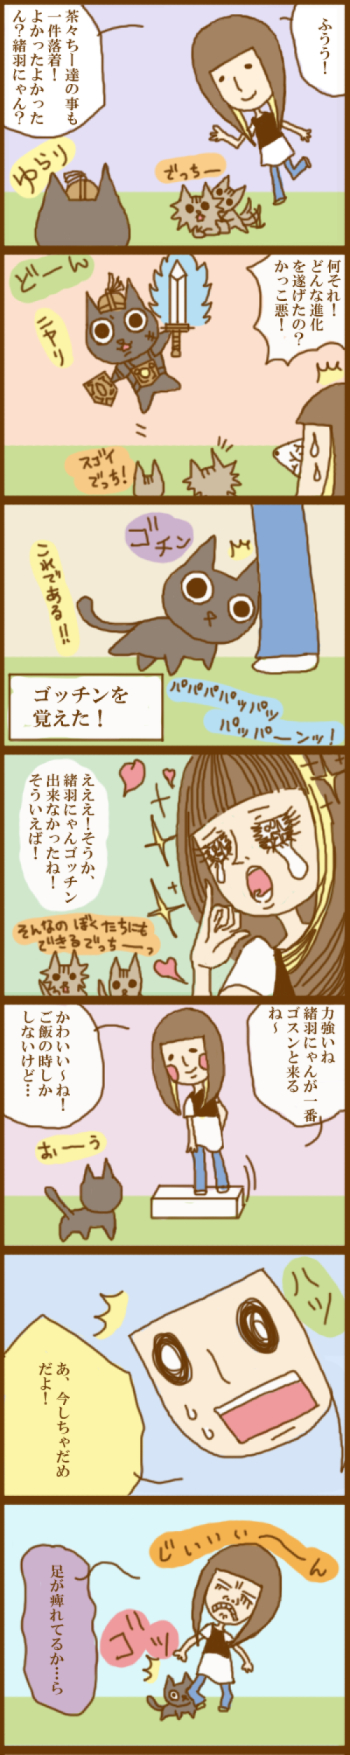 f:id:suzuokayu:20201124102932j:plain